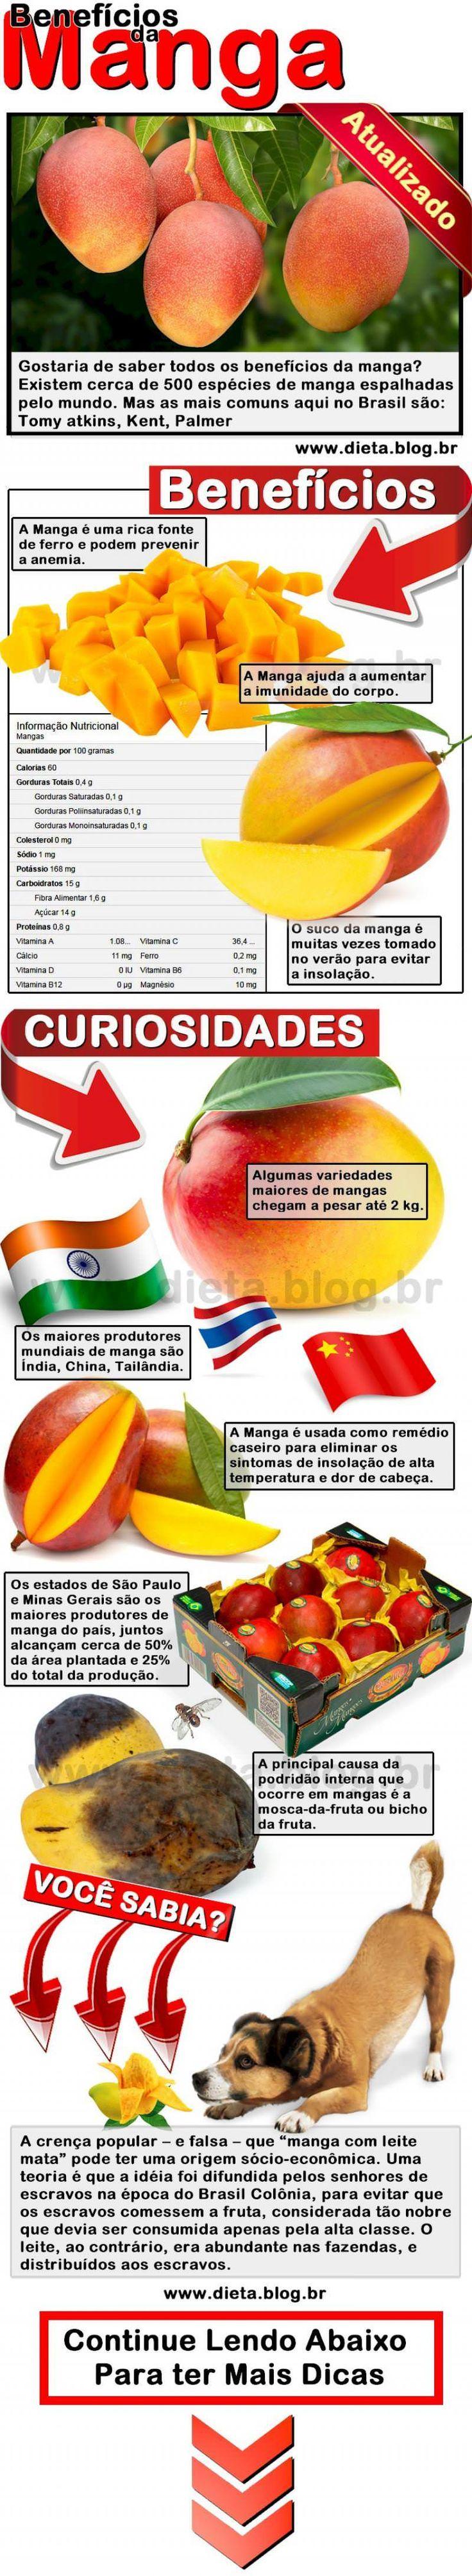 dieta.blog.br.beneficios-da-manga-nutrientes-e-vitaminas-para-saude-e-beleza